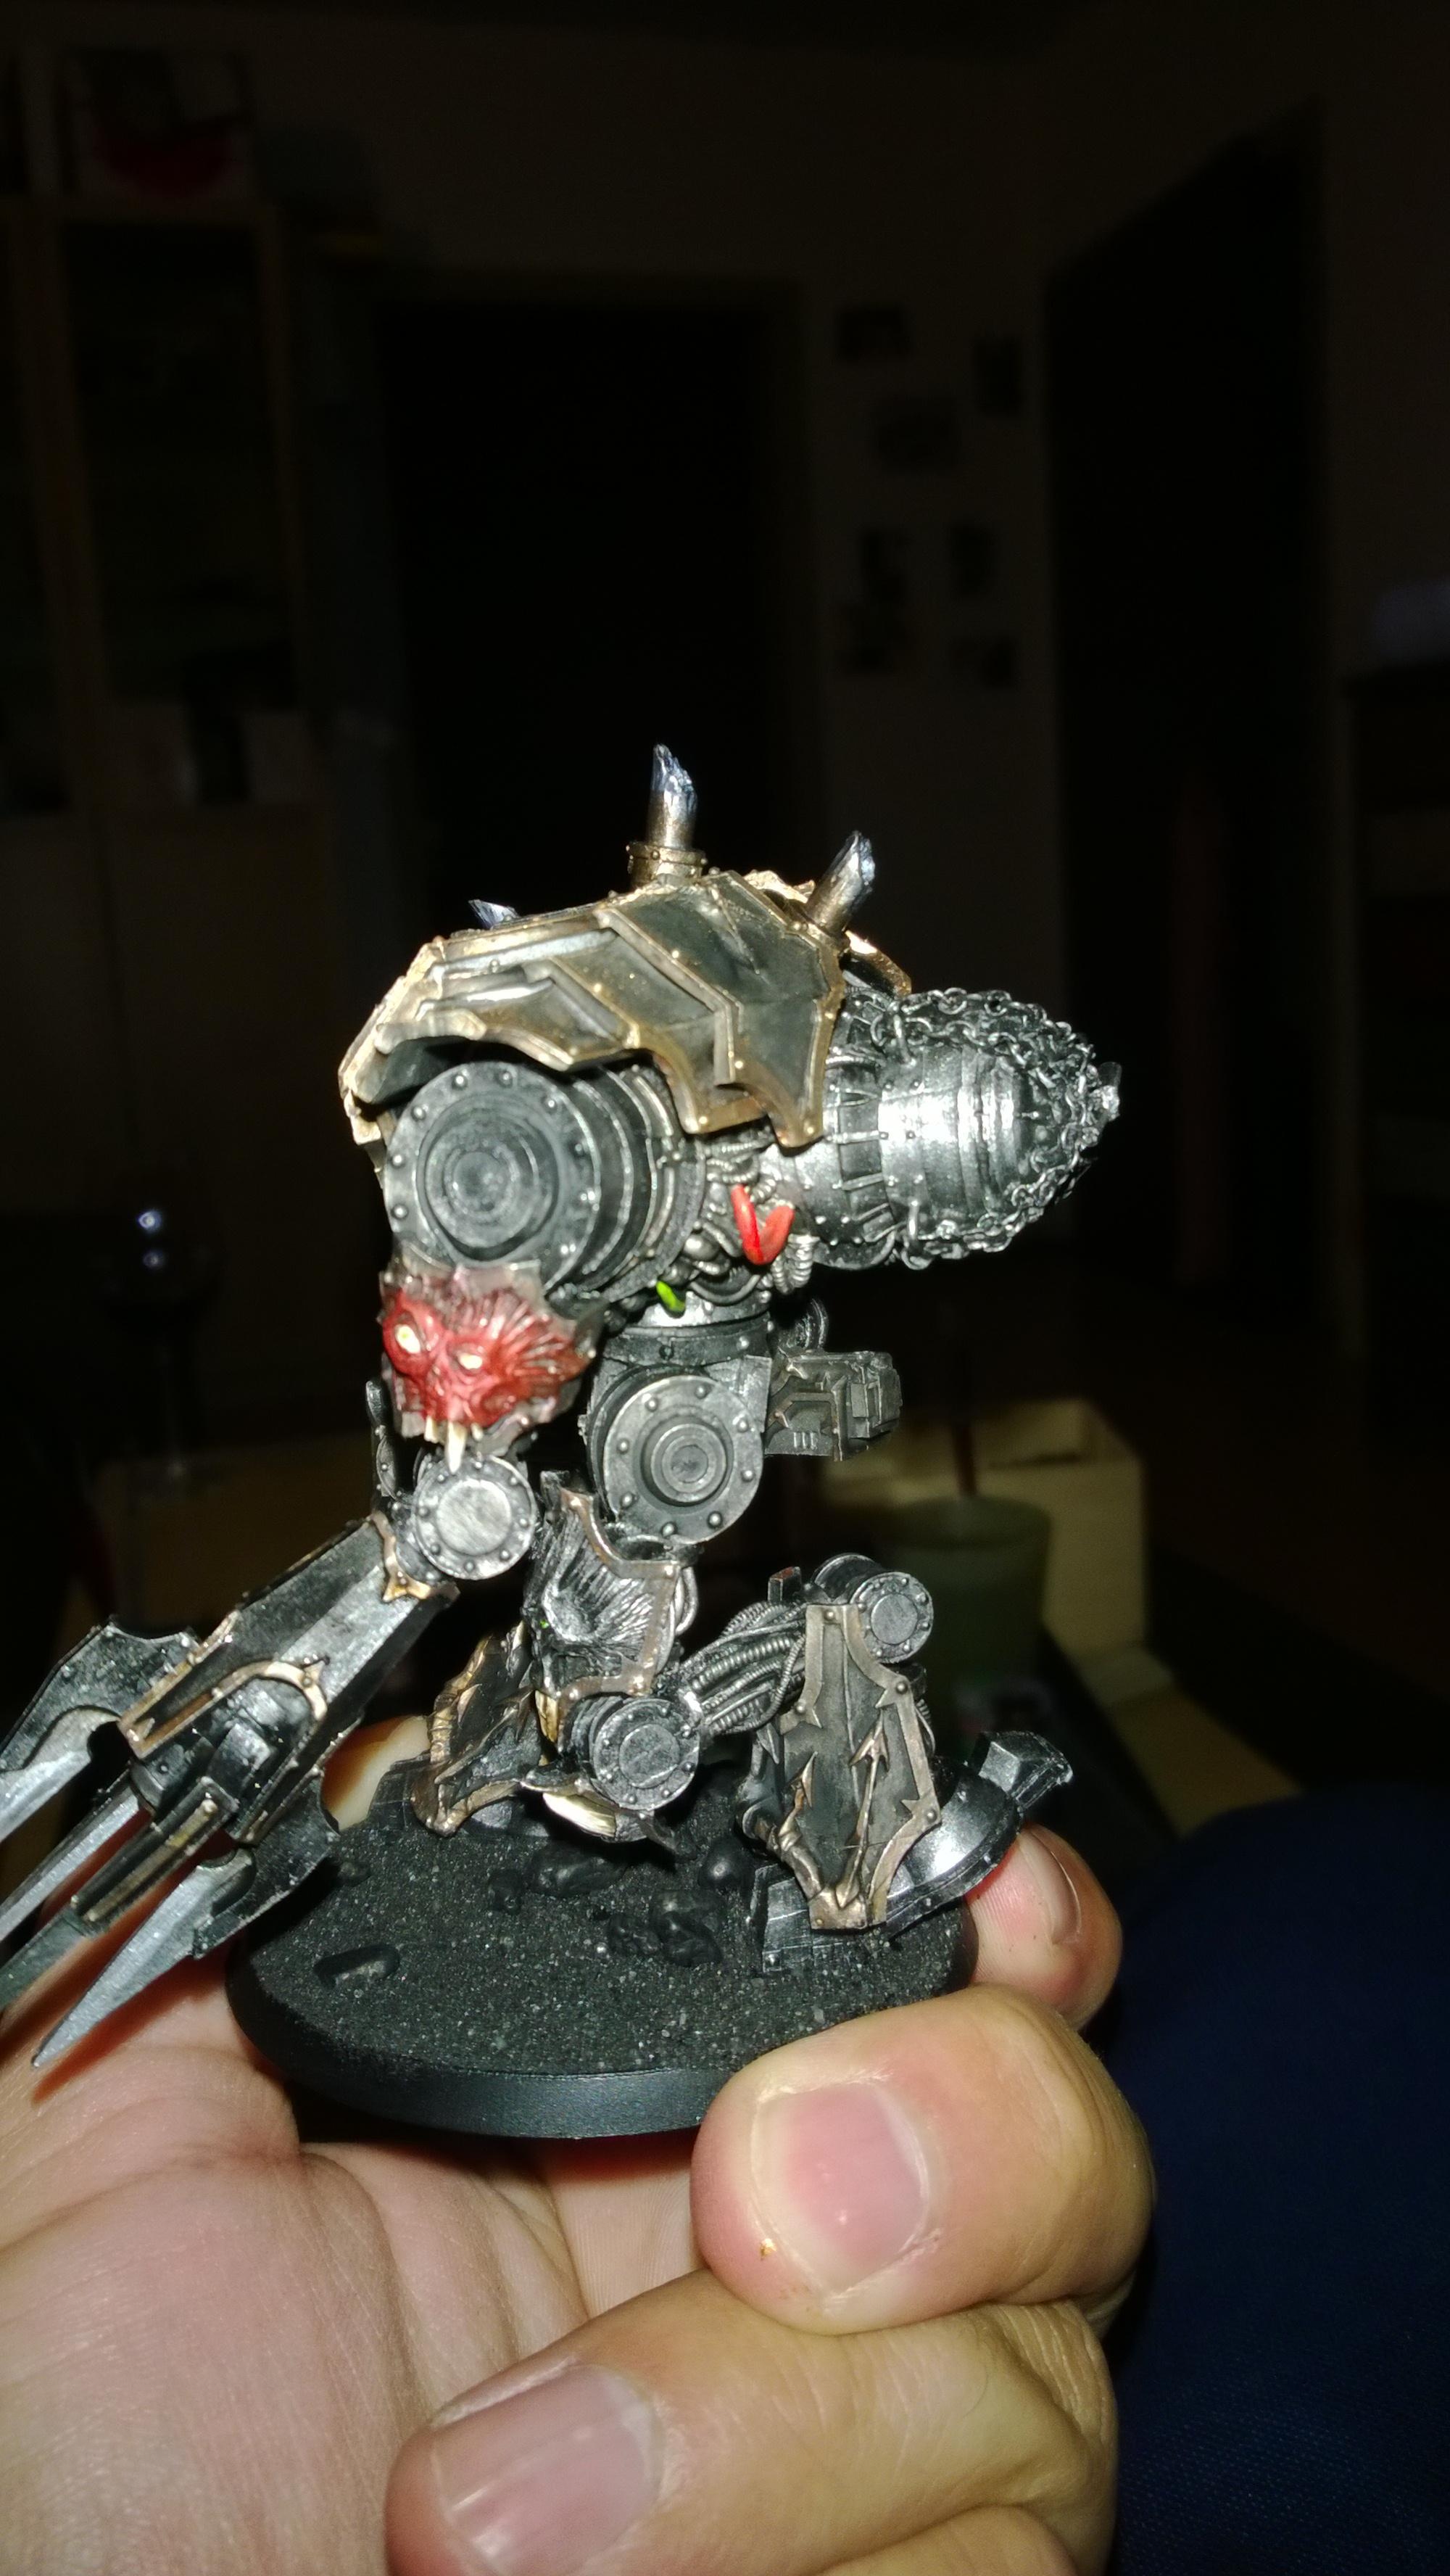 Cybot, Iw, IronWarrior CSM